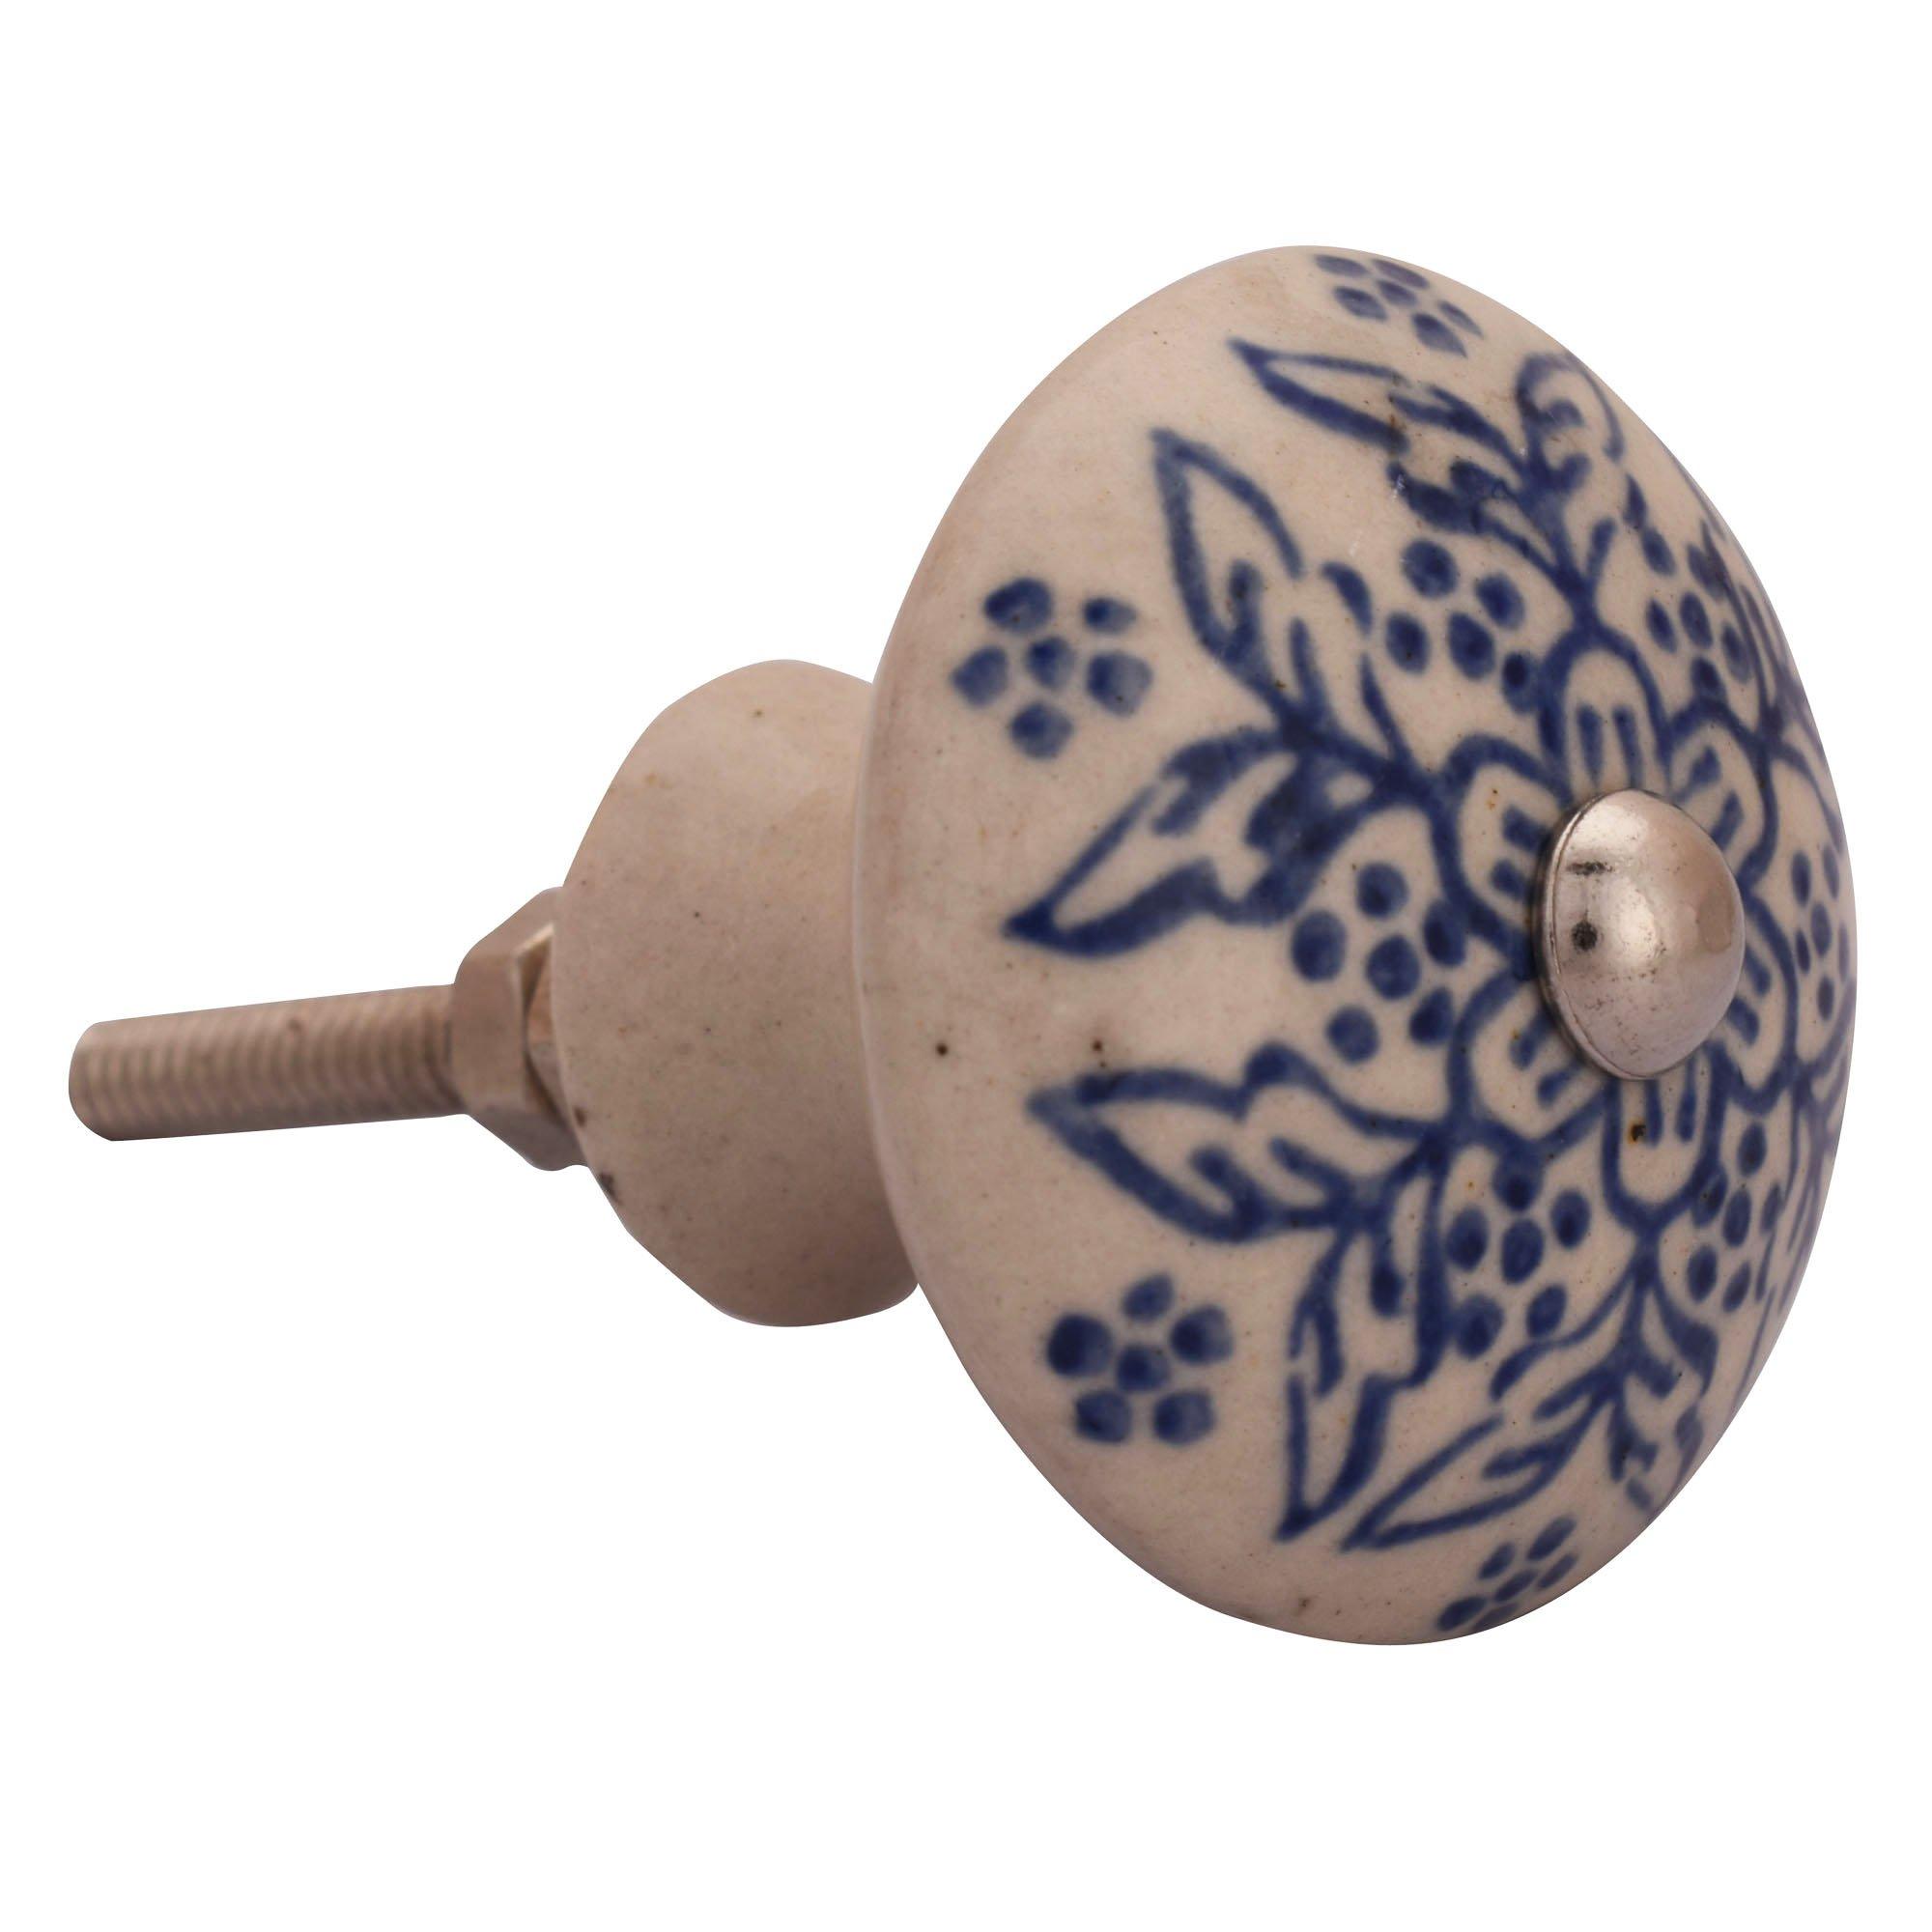 Decorative Ceramic Knob Set Dresser Cupboard Drawer Pulls Off White Knob India